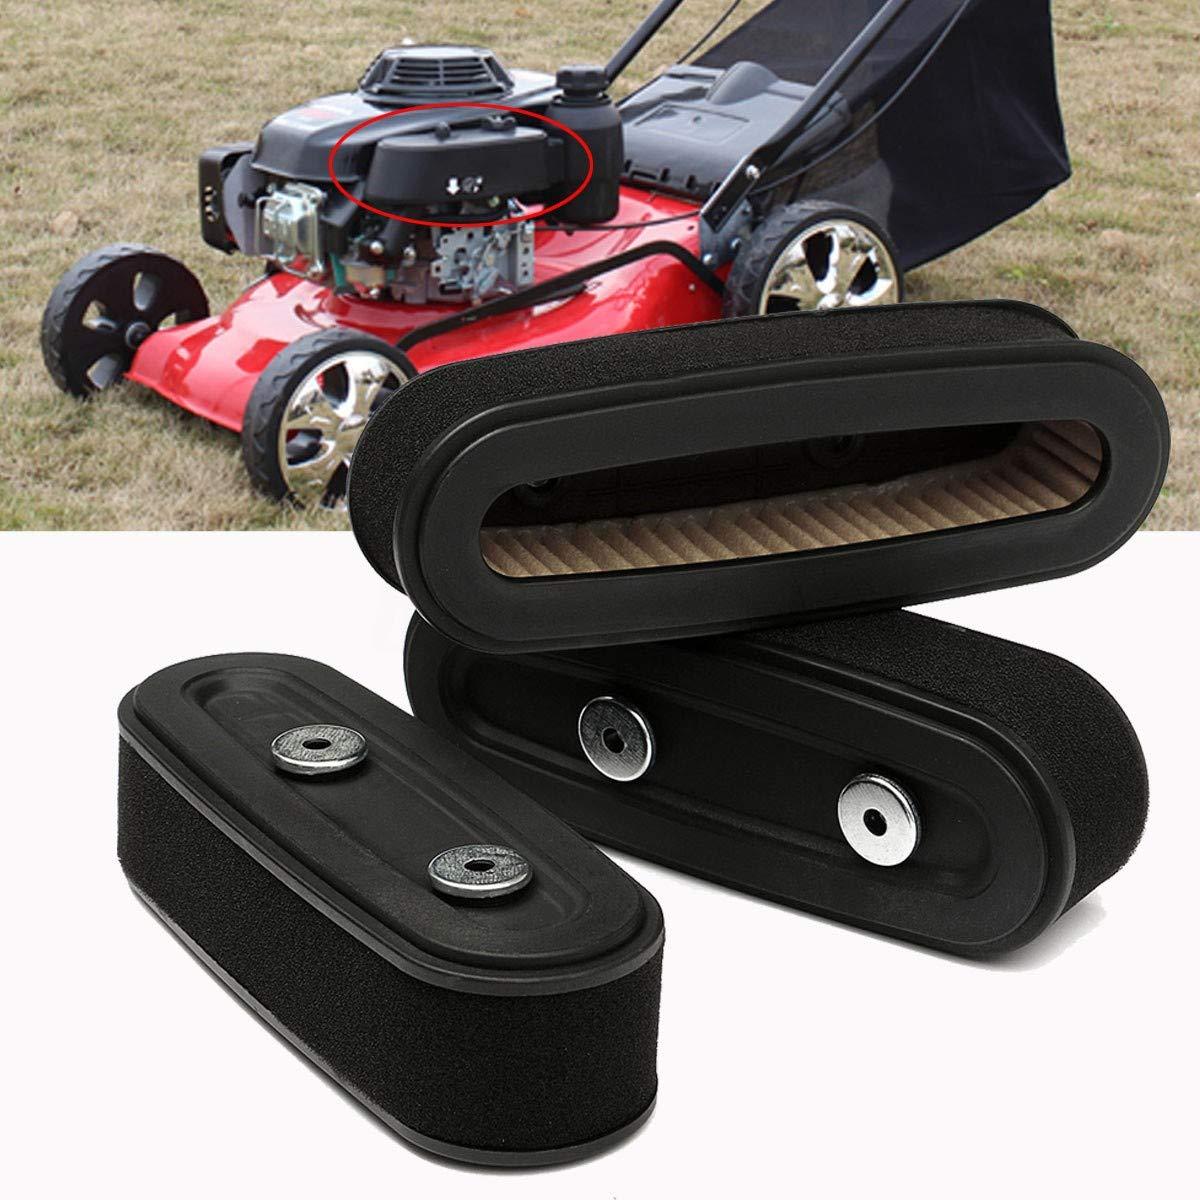 for Honda GXV160 Air Filter for HR216 for HRU216 Home /& Garden lawnmower Yard